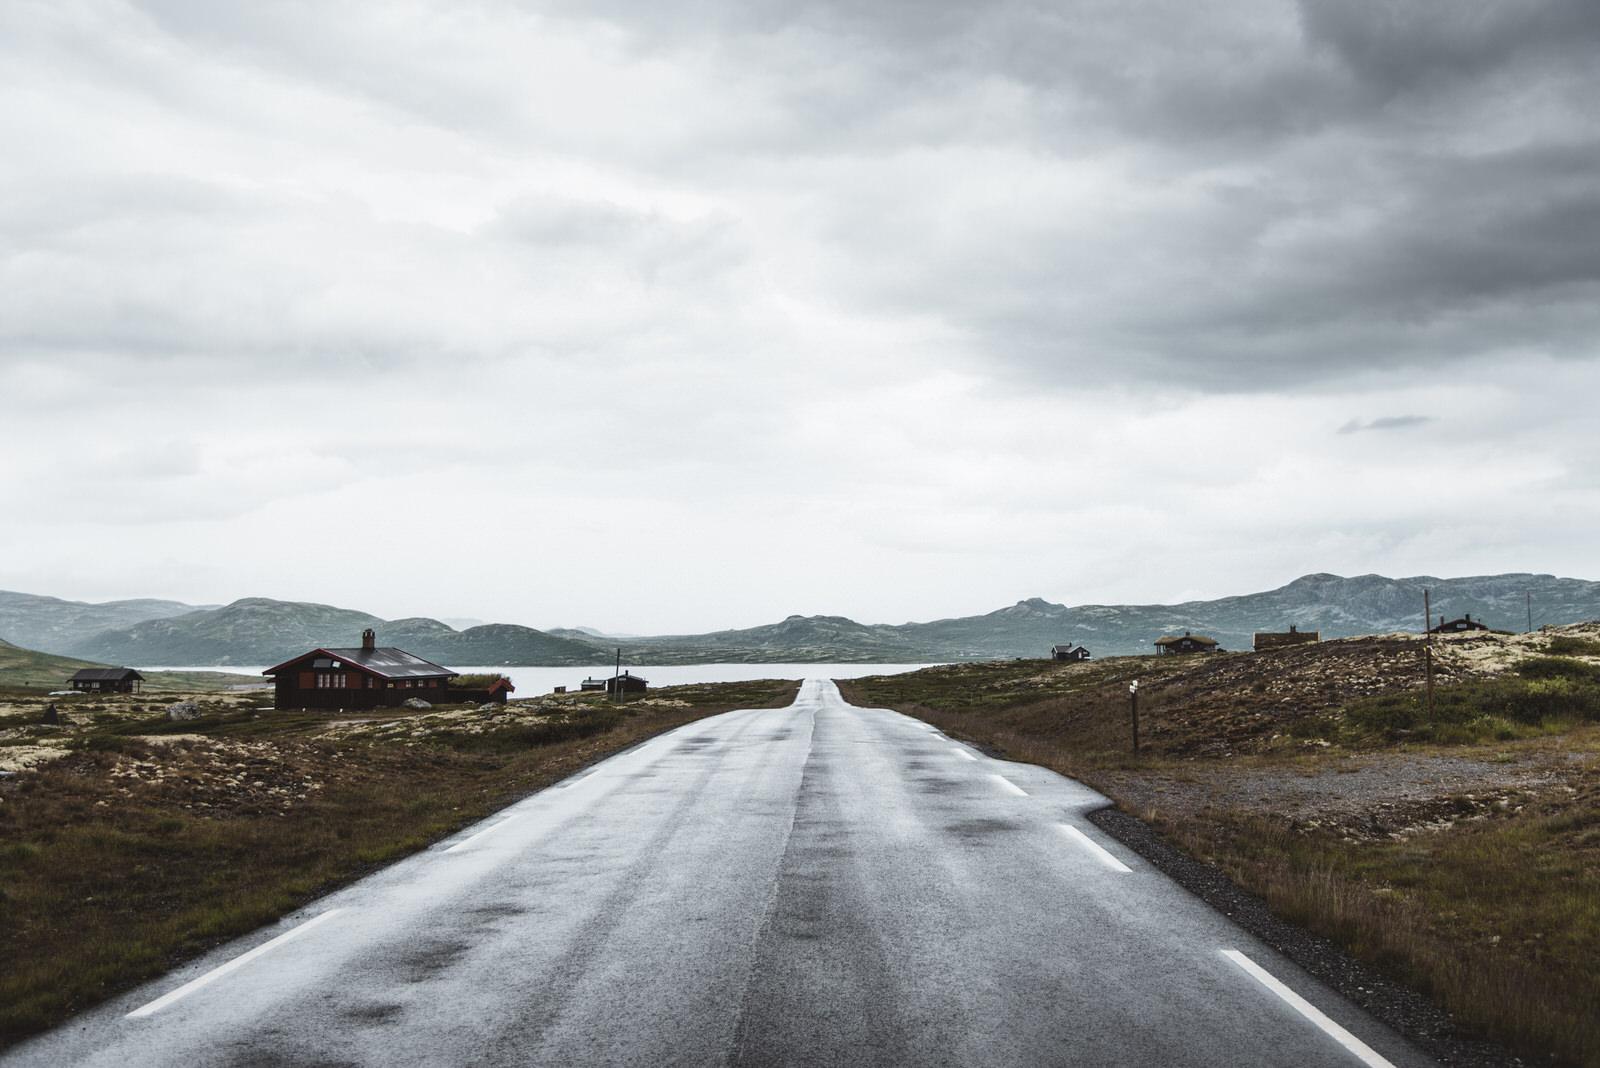 norway 2016 road trip part 2 telemark aust-agder